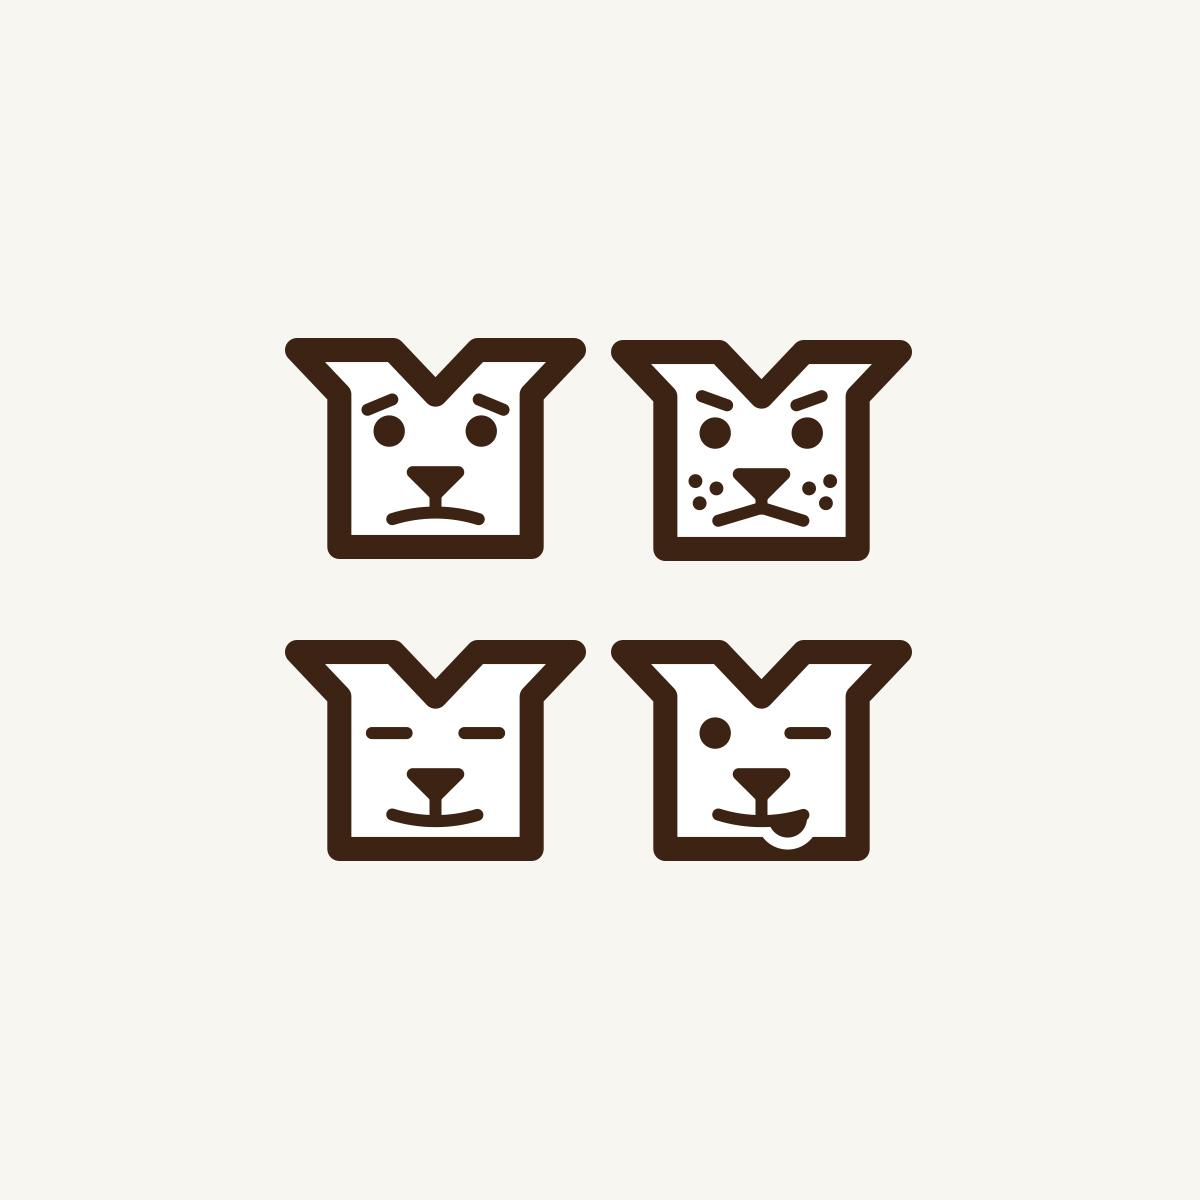 MD_Dog_Faces.jpg